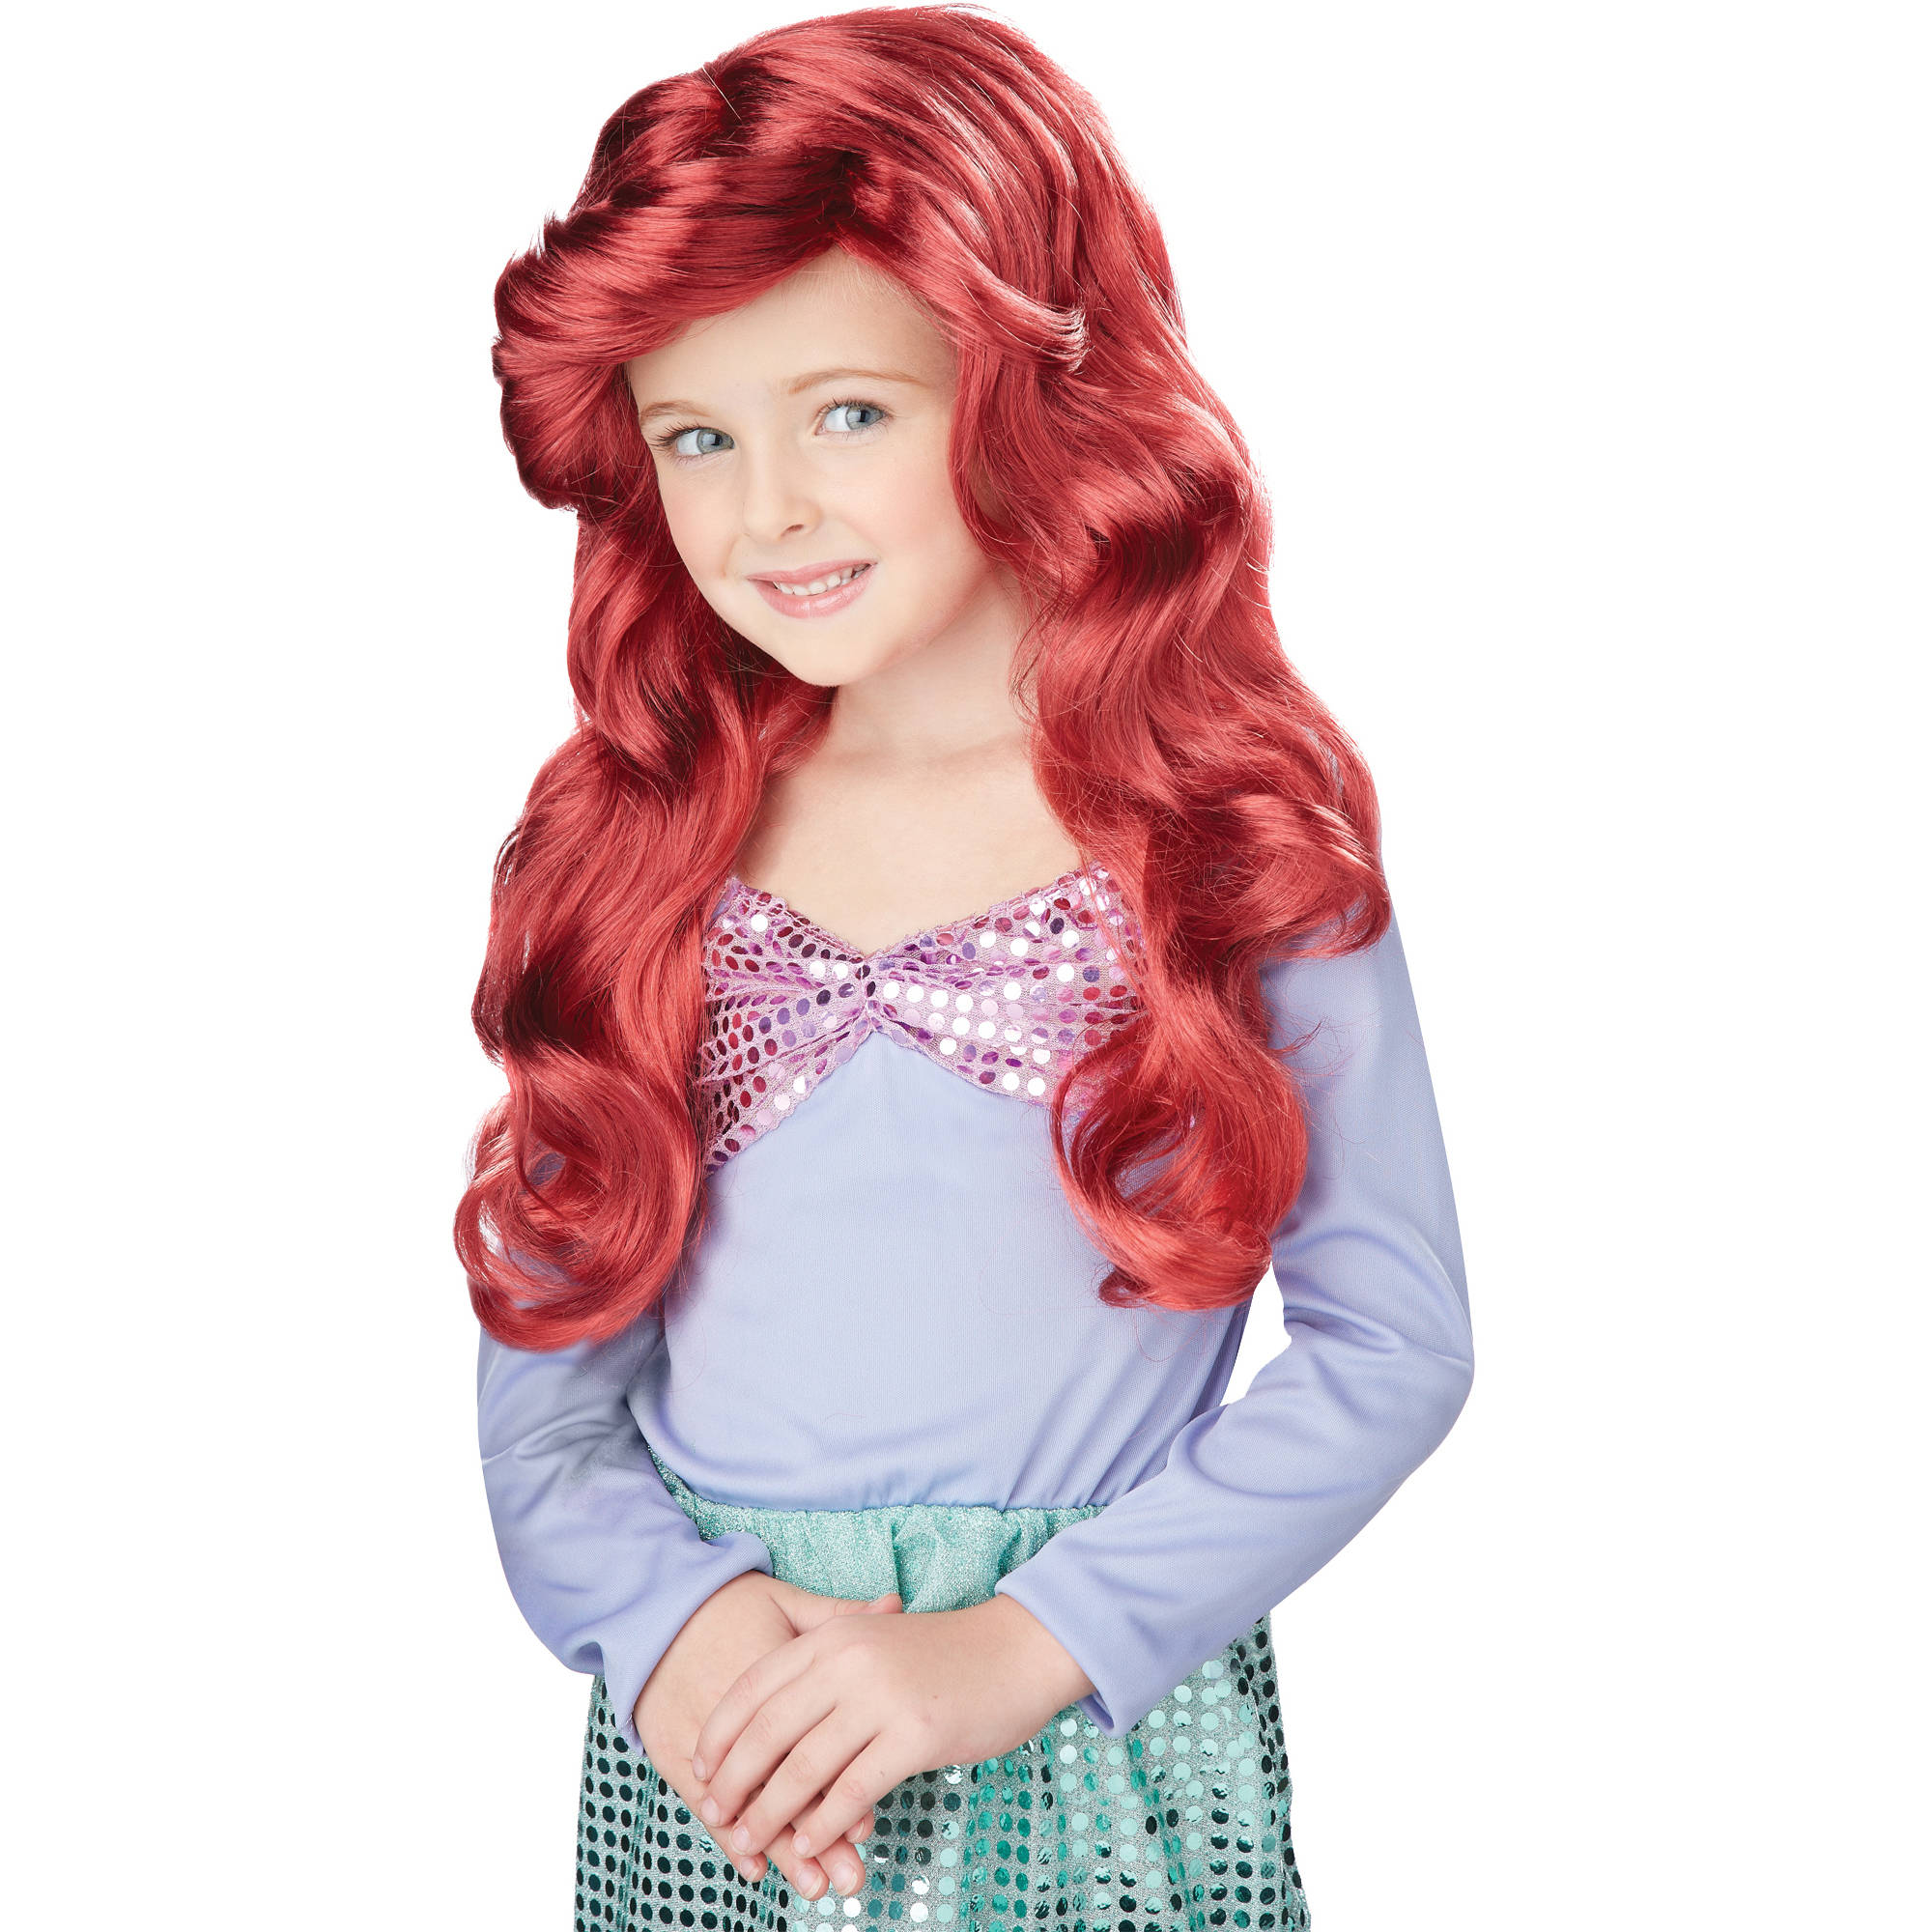 Disney Red Little Mermaid Wig Child Halloween Accessory